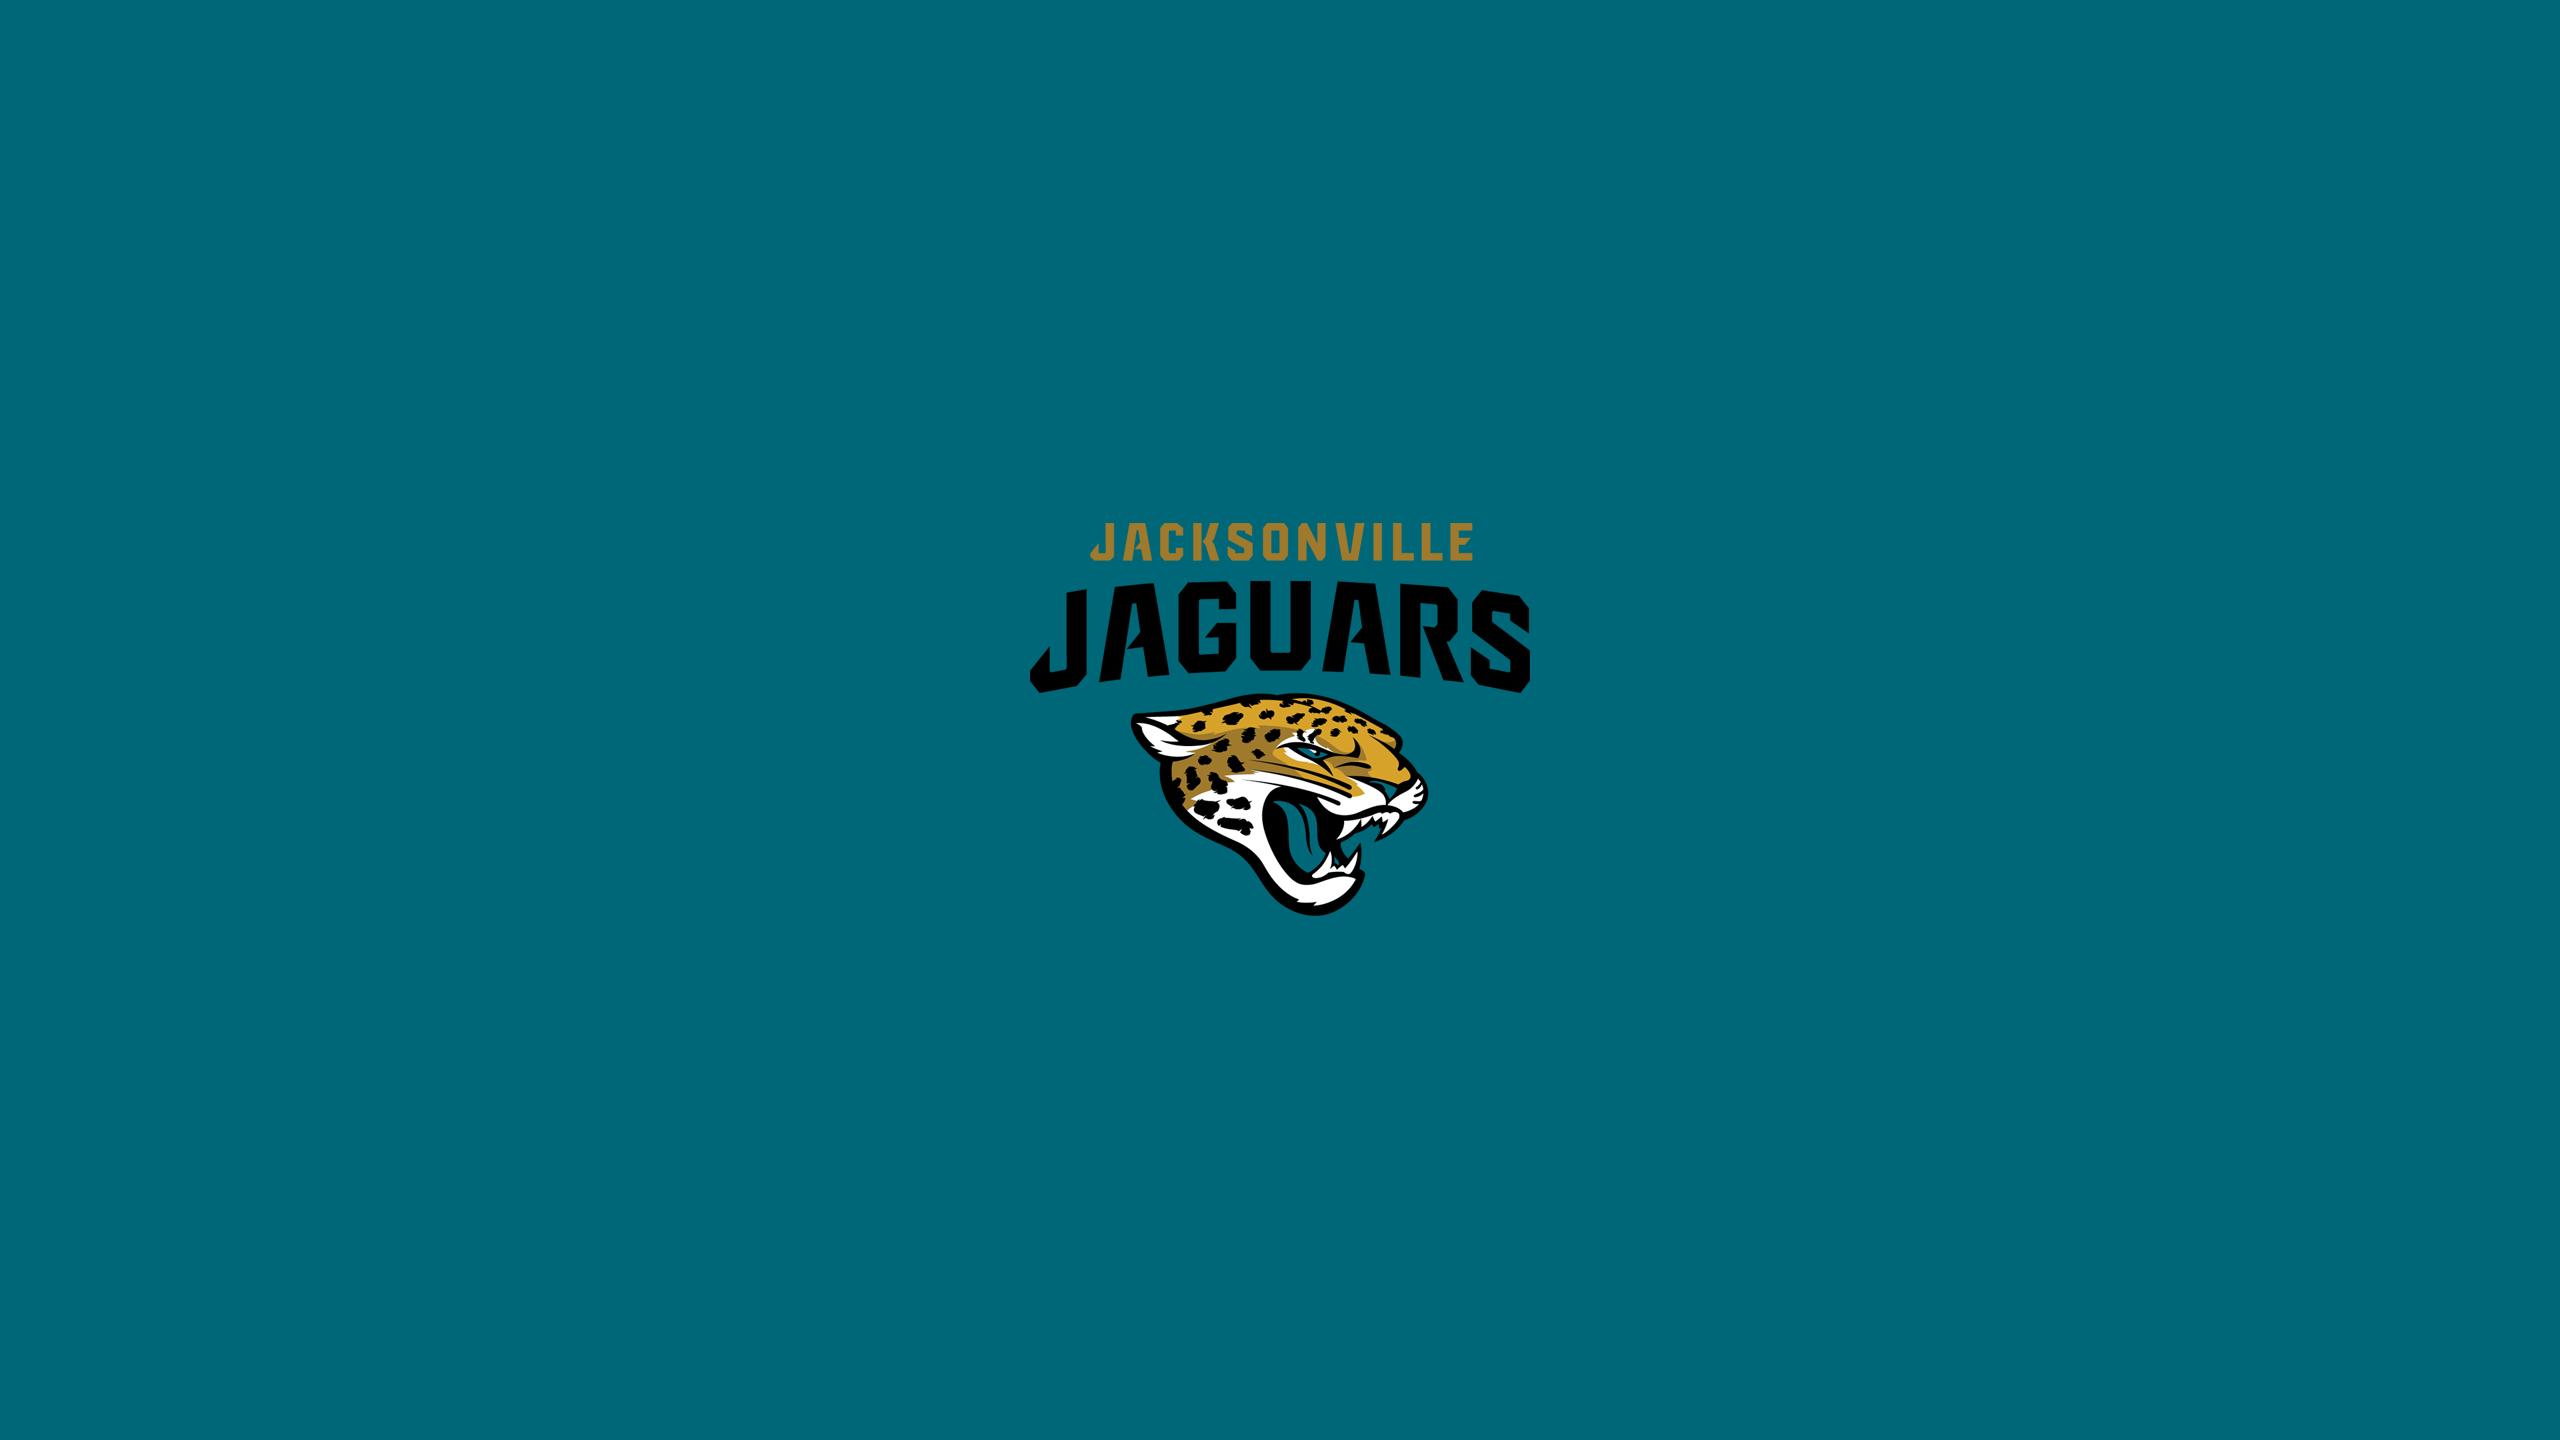 Jacksonville Jaguars Screensaver Foto Artis   Candydoll 2560x1440